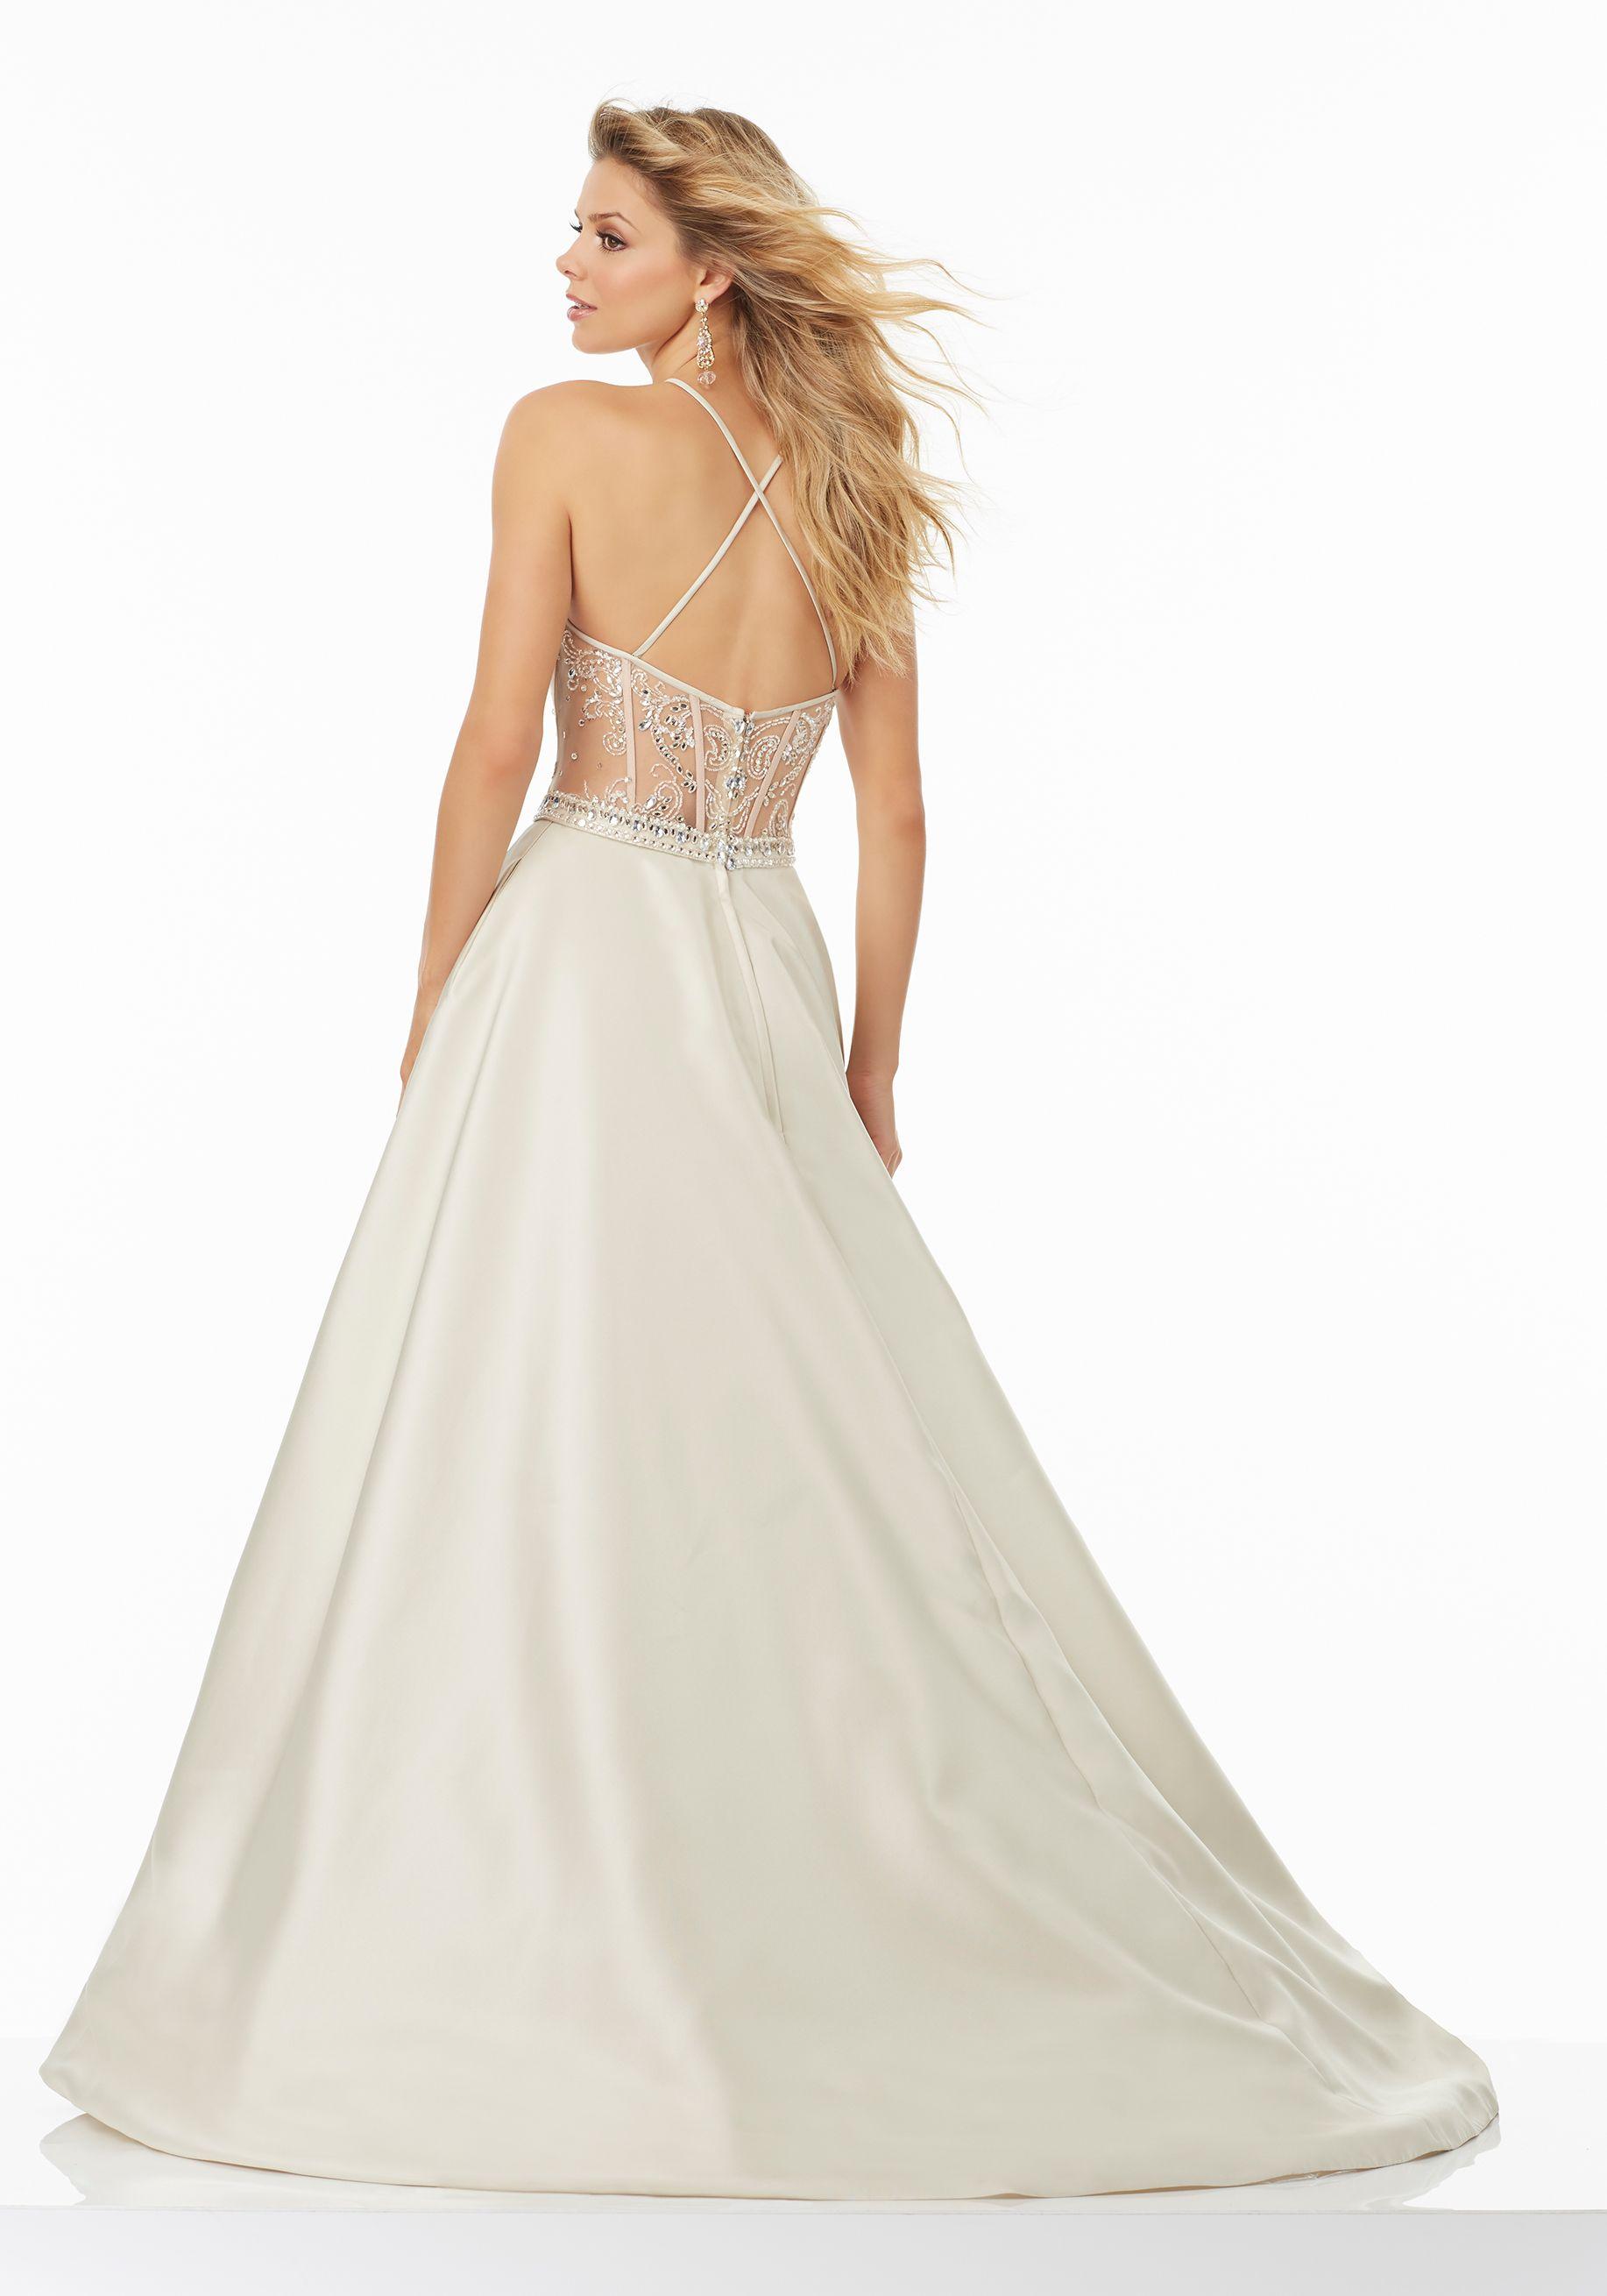 3538abeaf3 Larissa Satin Prom Gown with Beaded Net Illusion Bodice